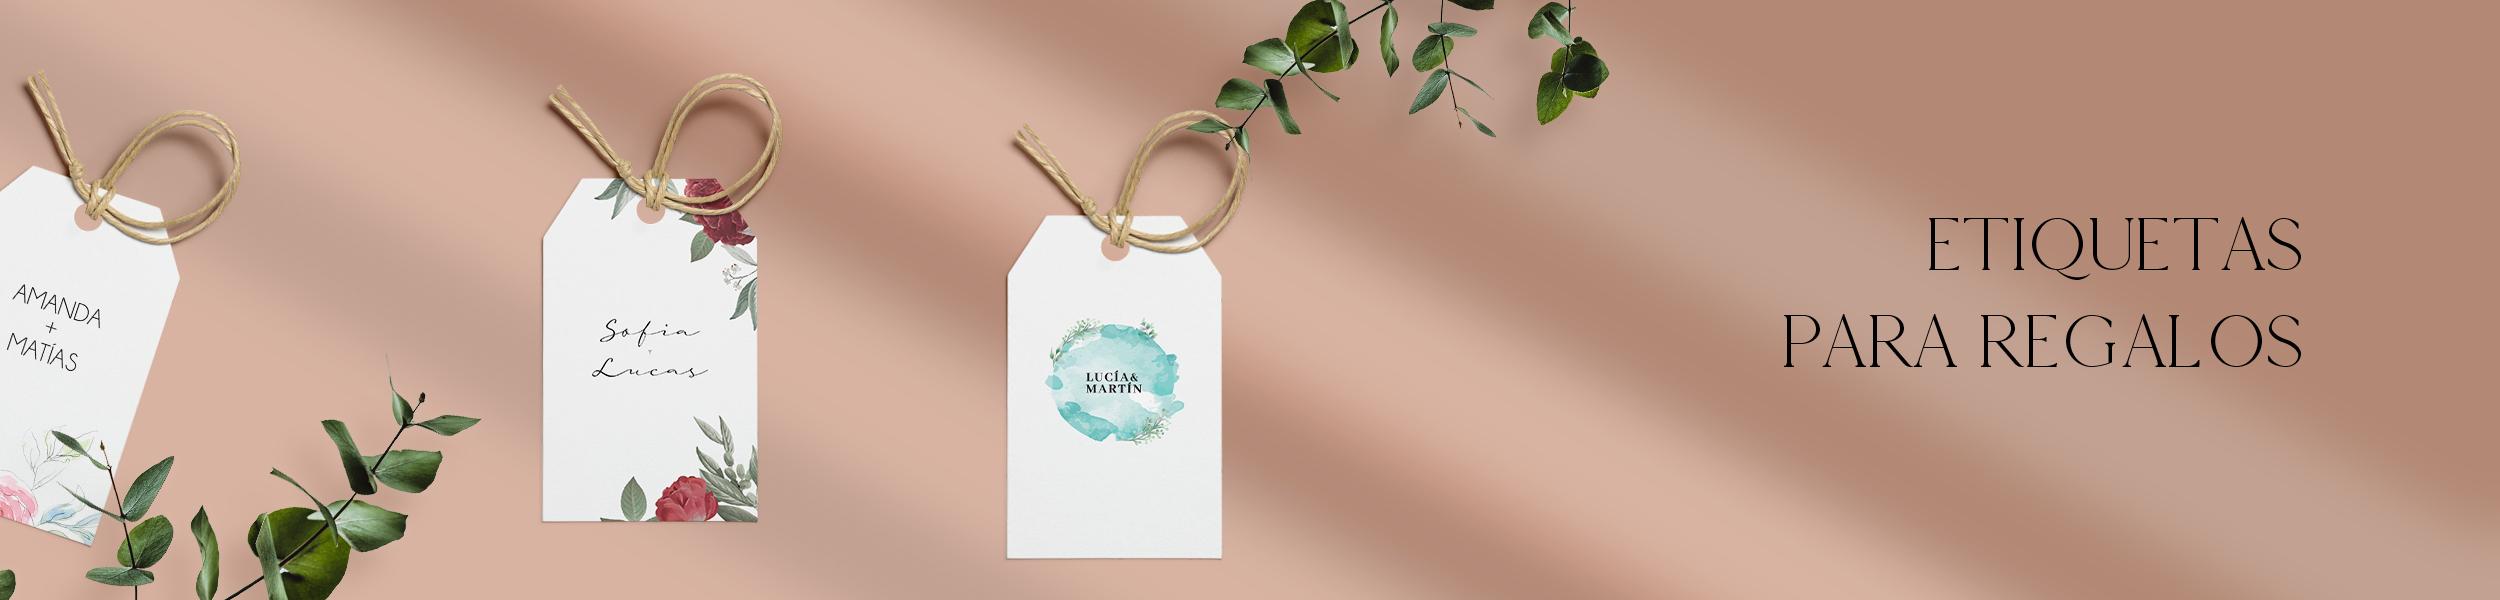 Etiquetas para regalos de matrimonio